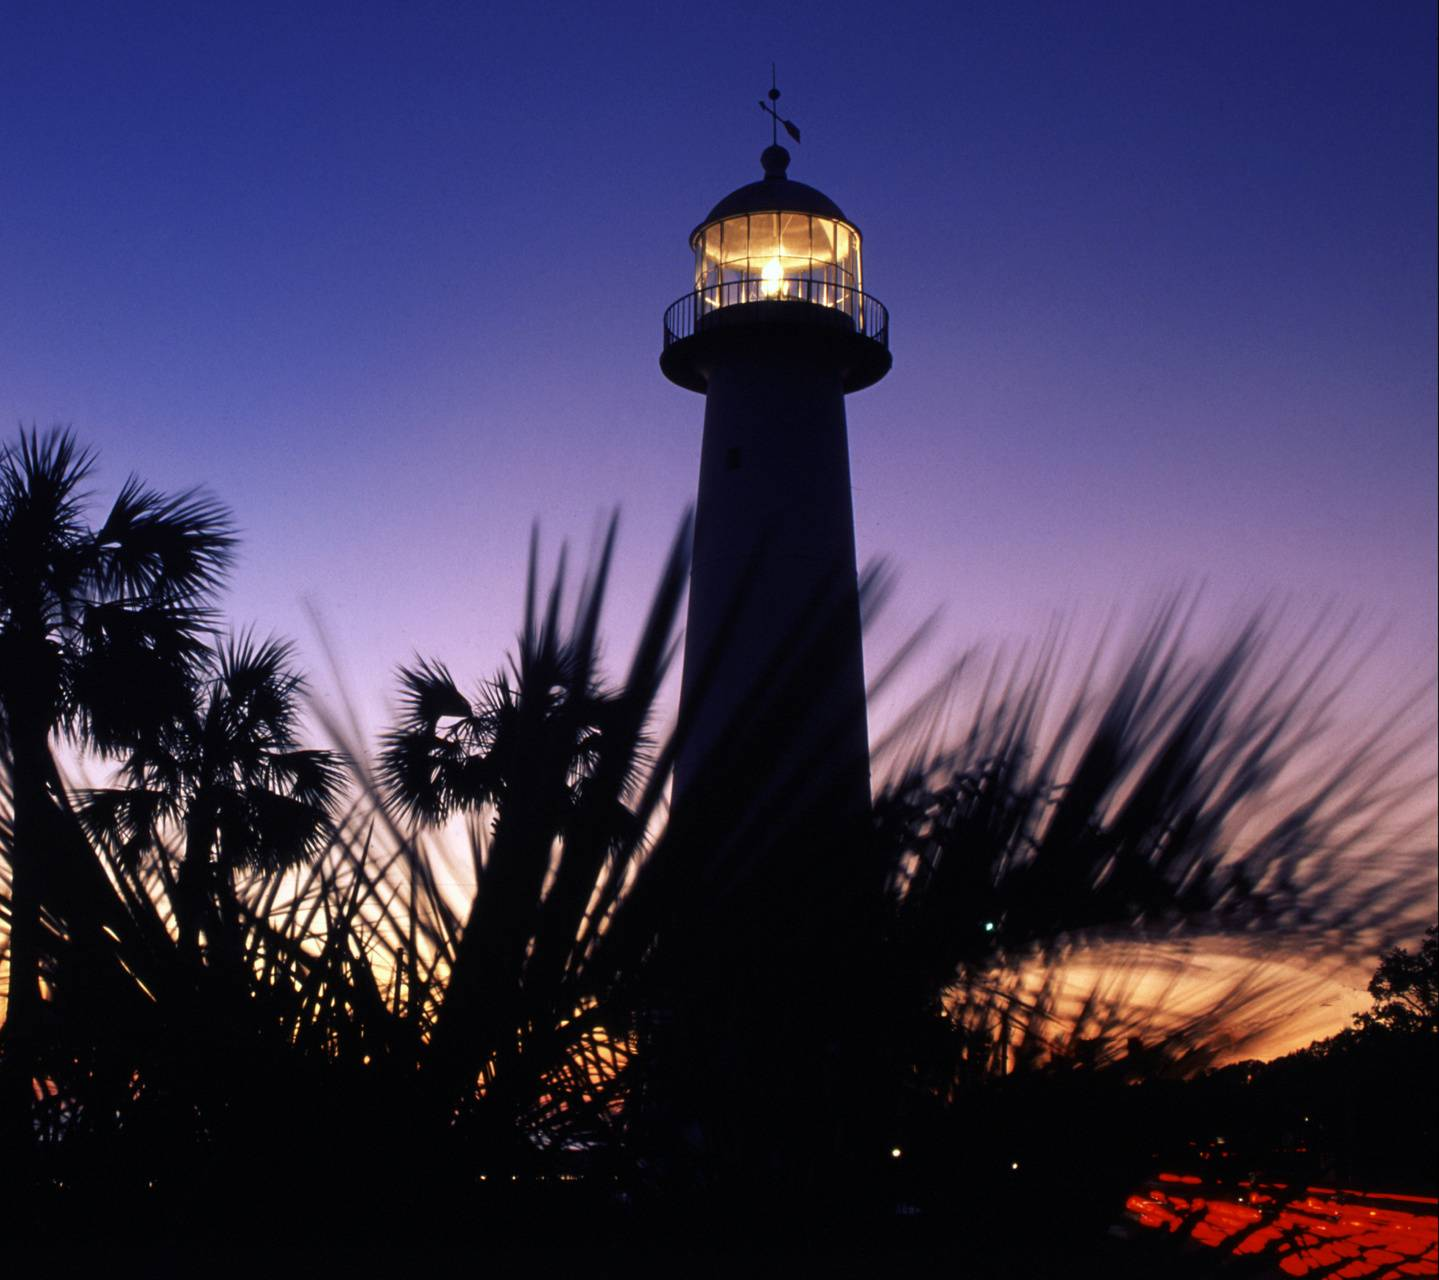 Biloxi Lighthouse Wallpaper By Paganuploads 3c Free On Zedge